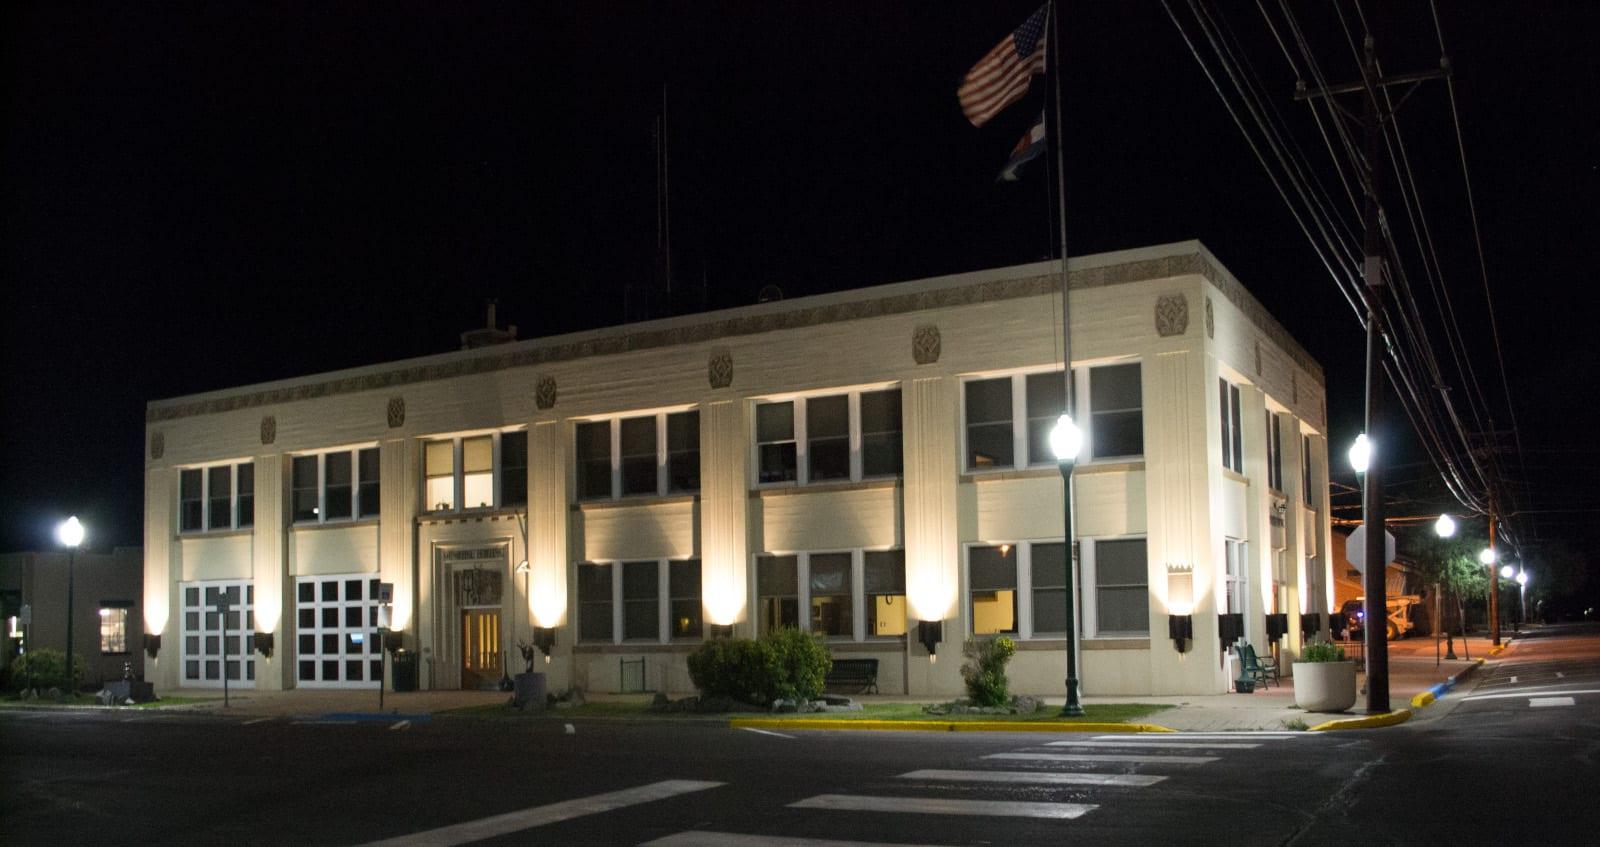 Gunnison CO Municipal Building Exterior Night